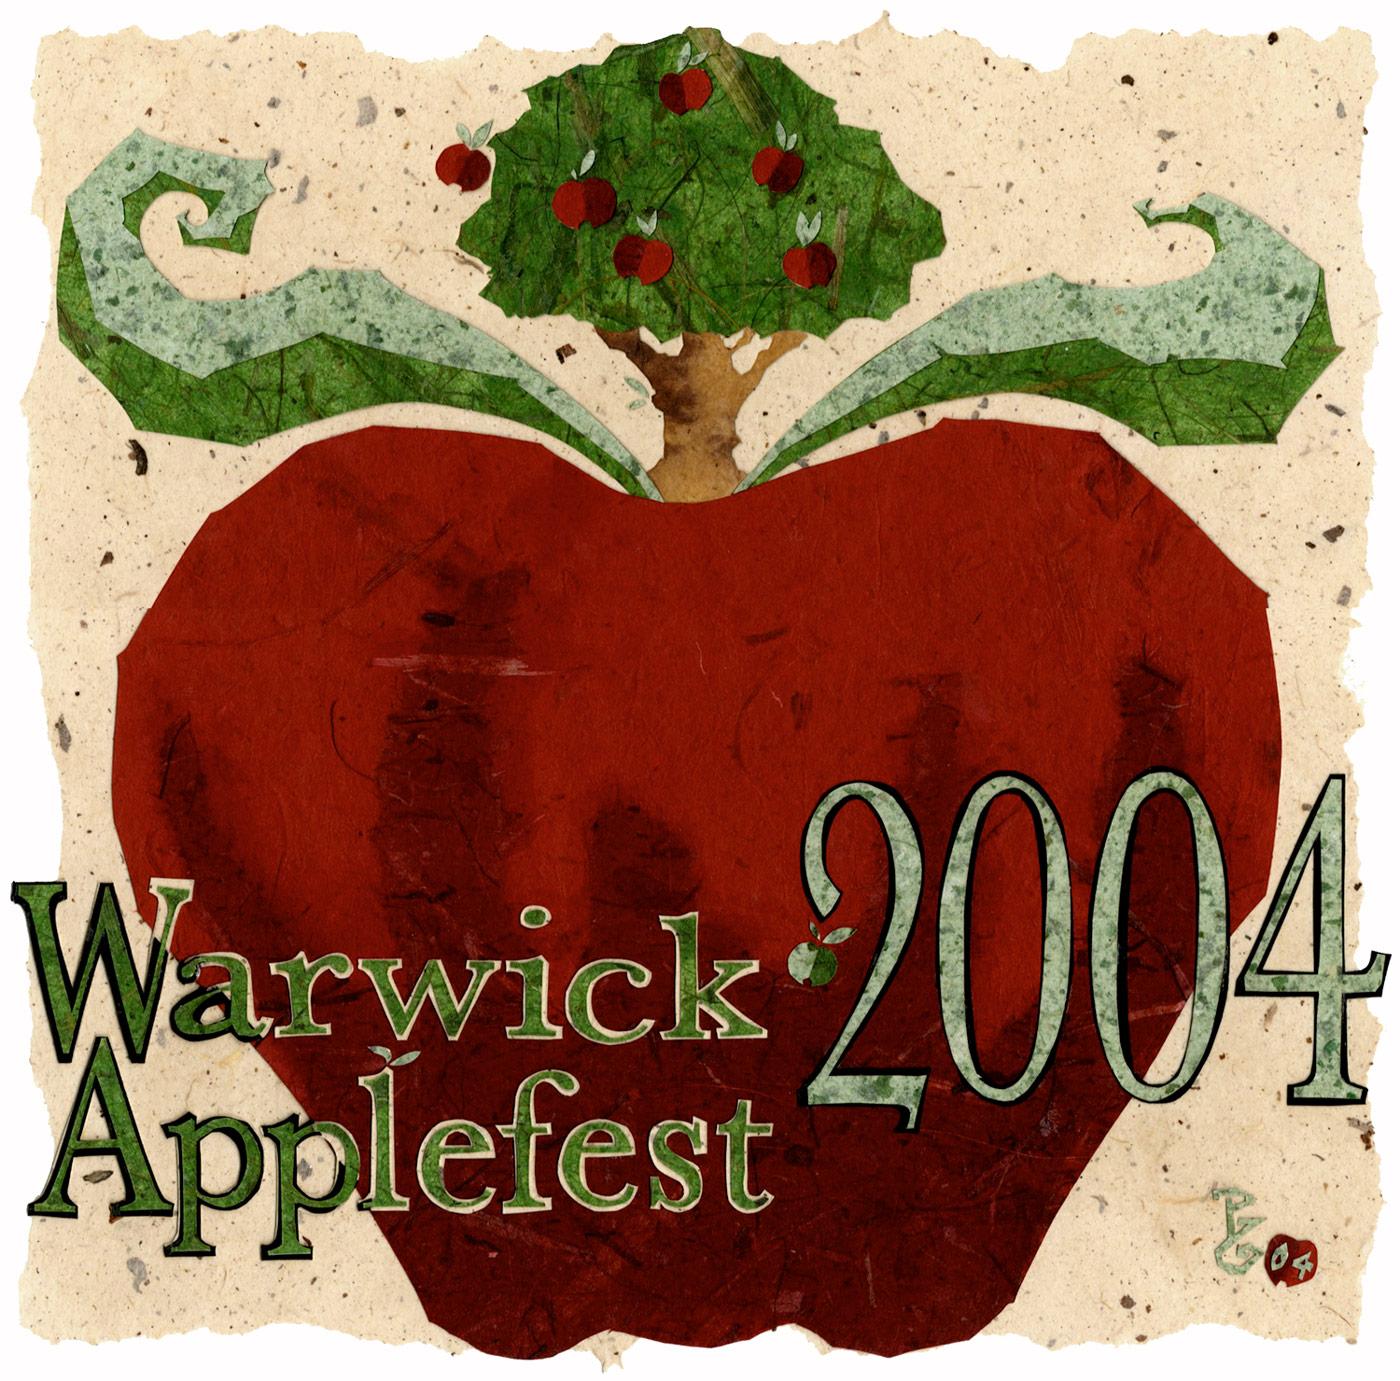 ⊛  Warwick Applefest 2004 Logo Design (for posters, t-shirts, etc.)   ⊛ cut + torn paper / illustration board  ⊛ 10 x 10 in • 254 x 254 mm